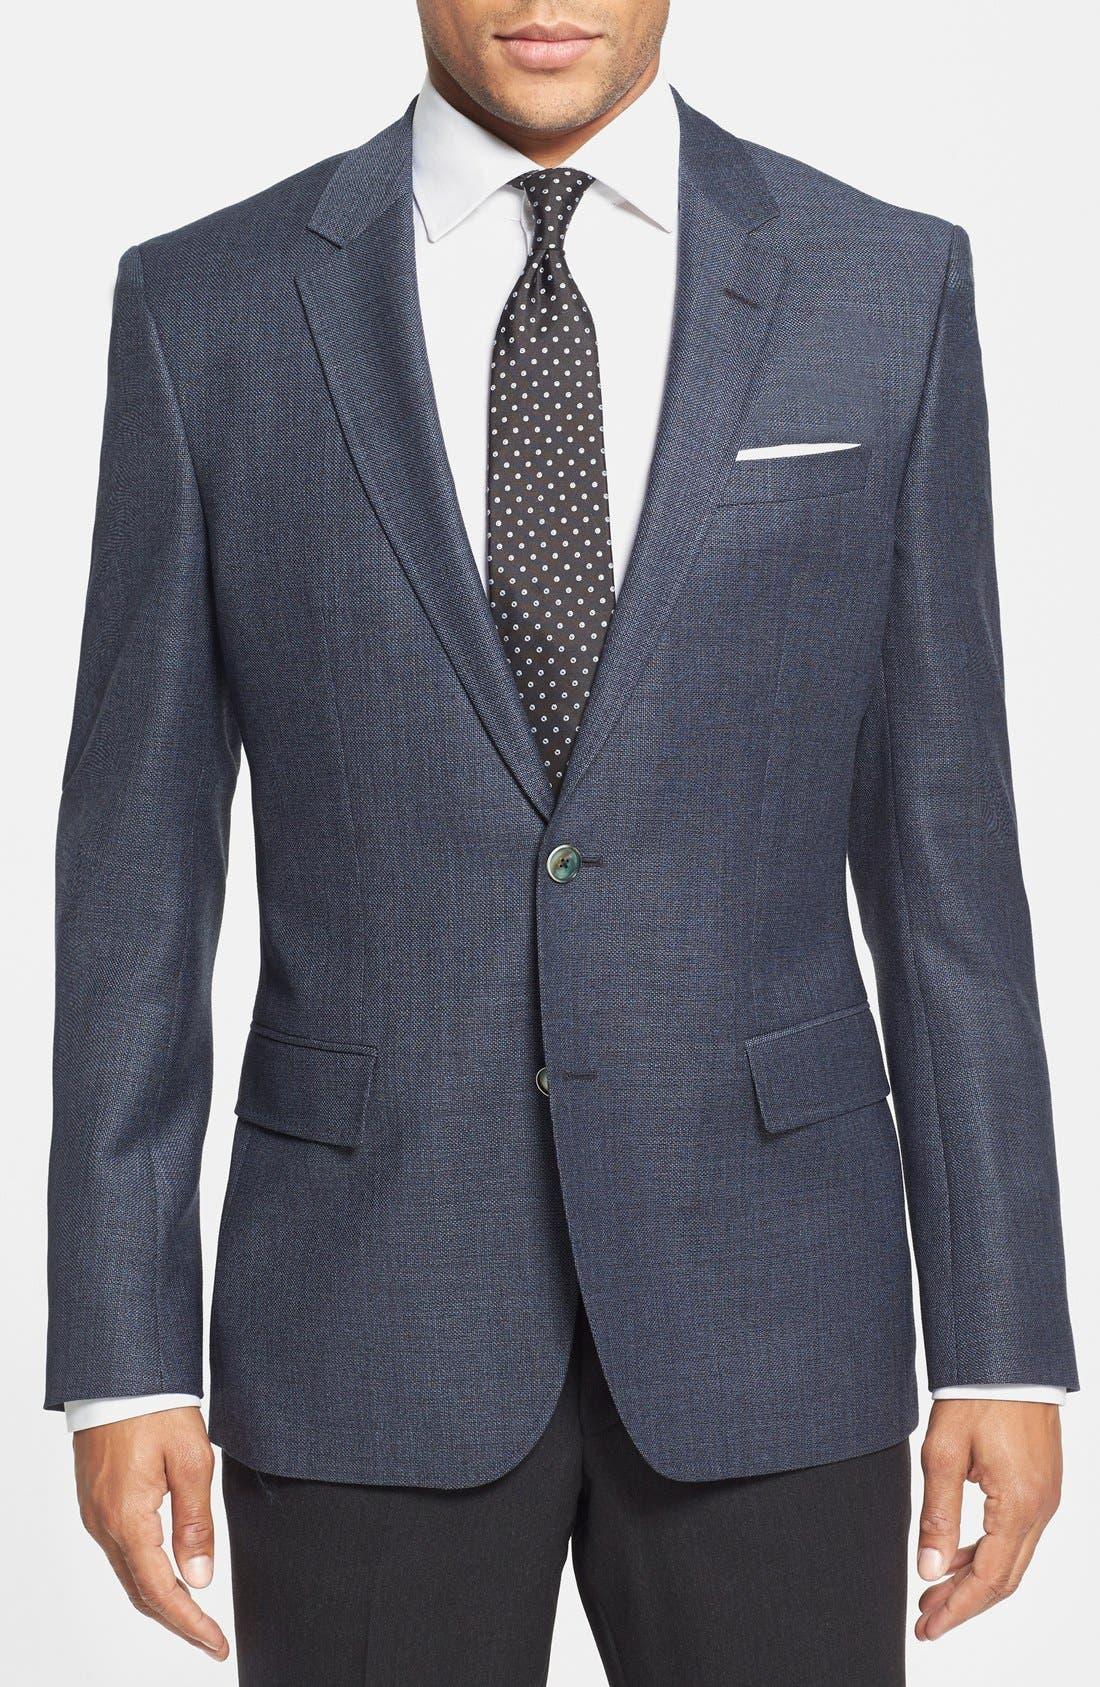 Alternate Image 1 Selected - BOSS HUGO BOSS 'Hutson' Trim Fit Wool Blazer